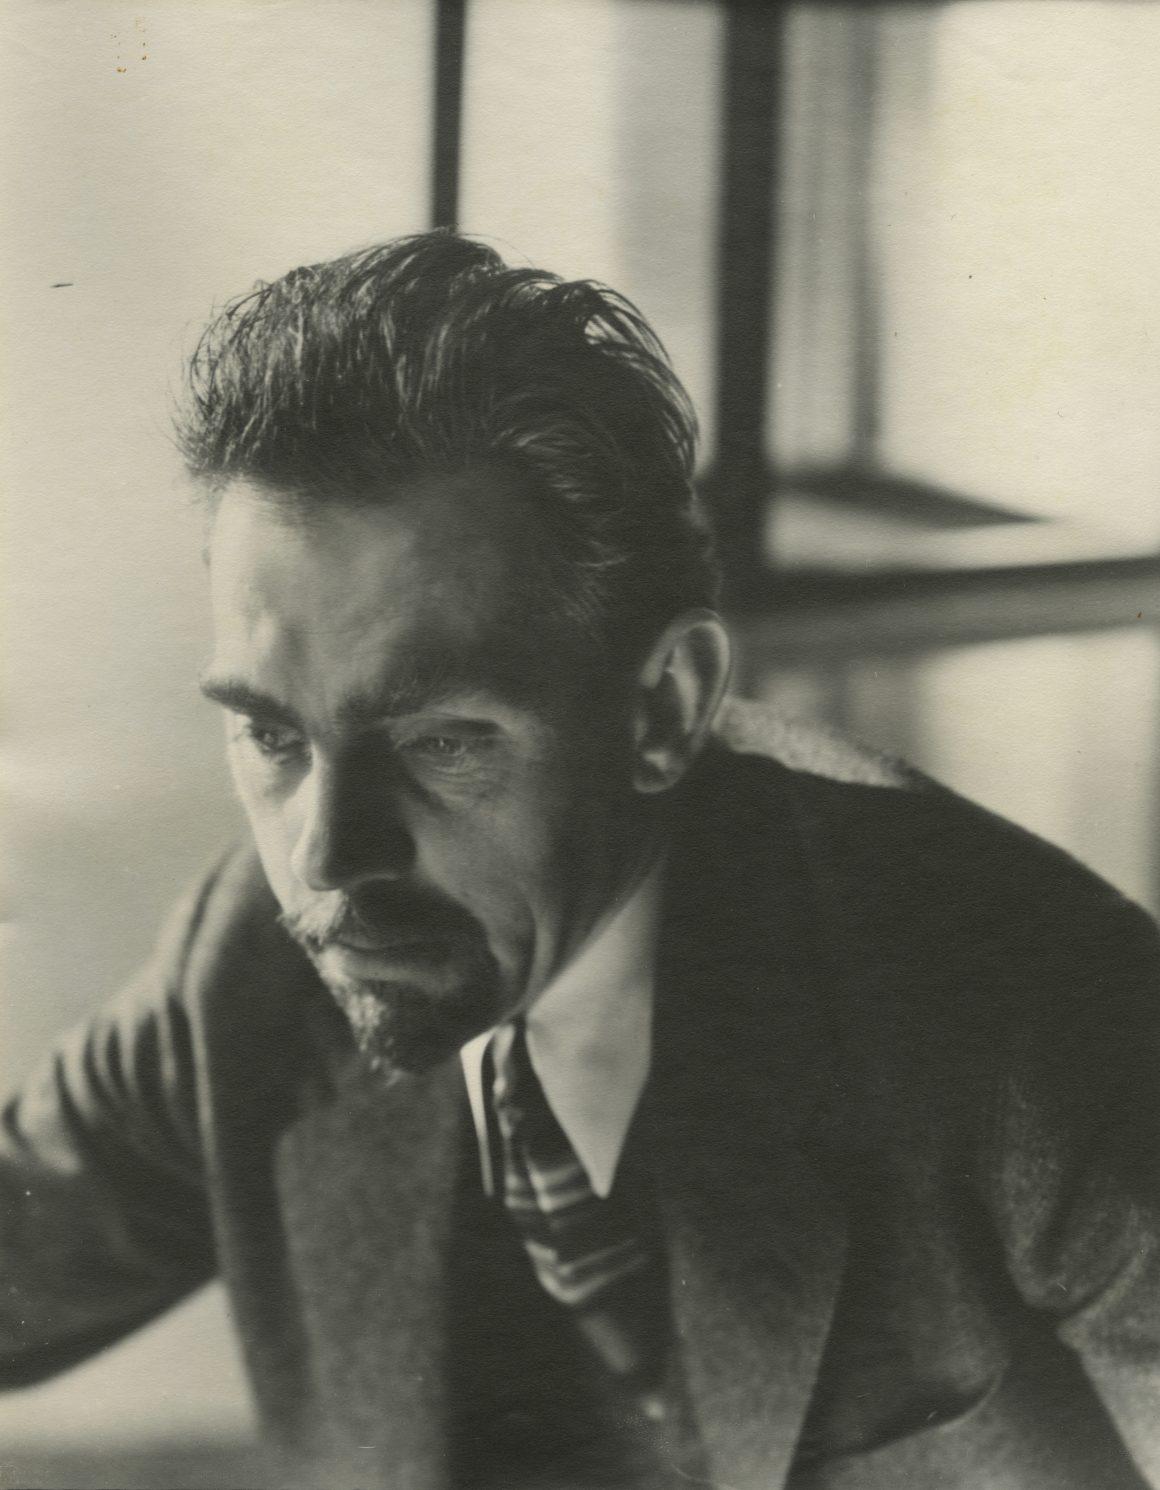 Jonson by Gerlach, 1932